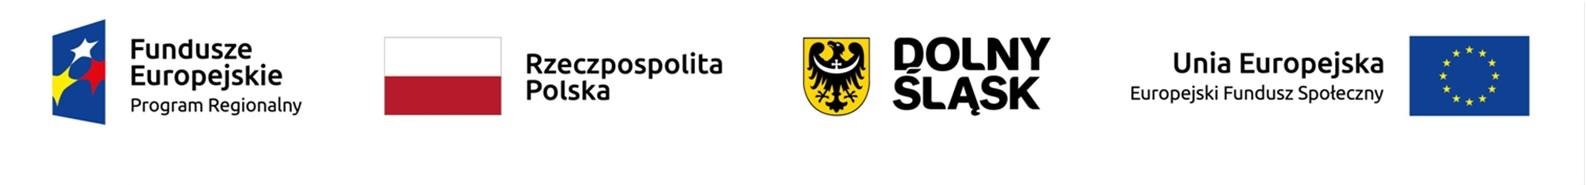 Logo FE - RP - Dolny Śląsk - UE EFS